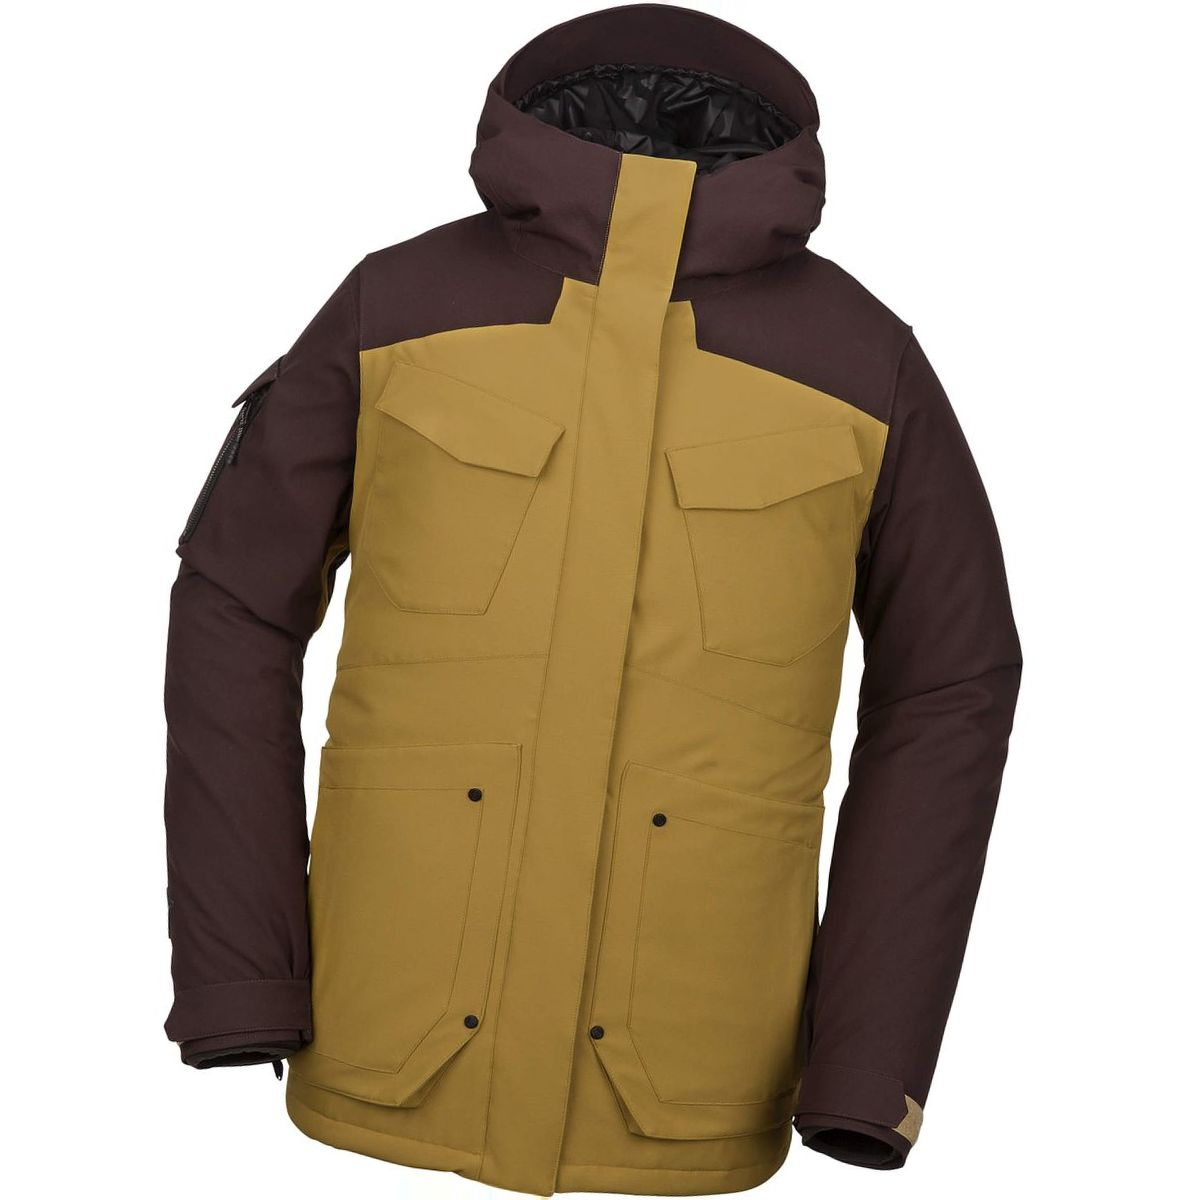 Volcom VCO Inferno Insulated Jacket - Men's